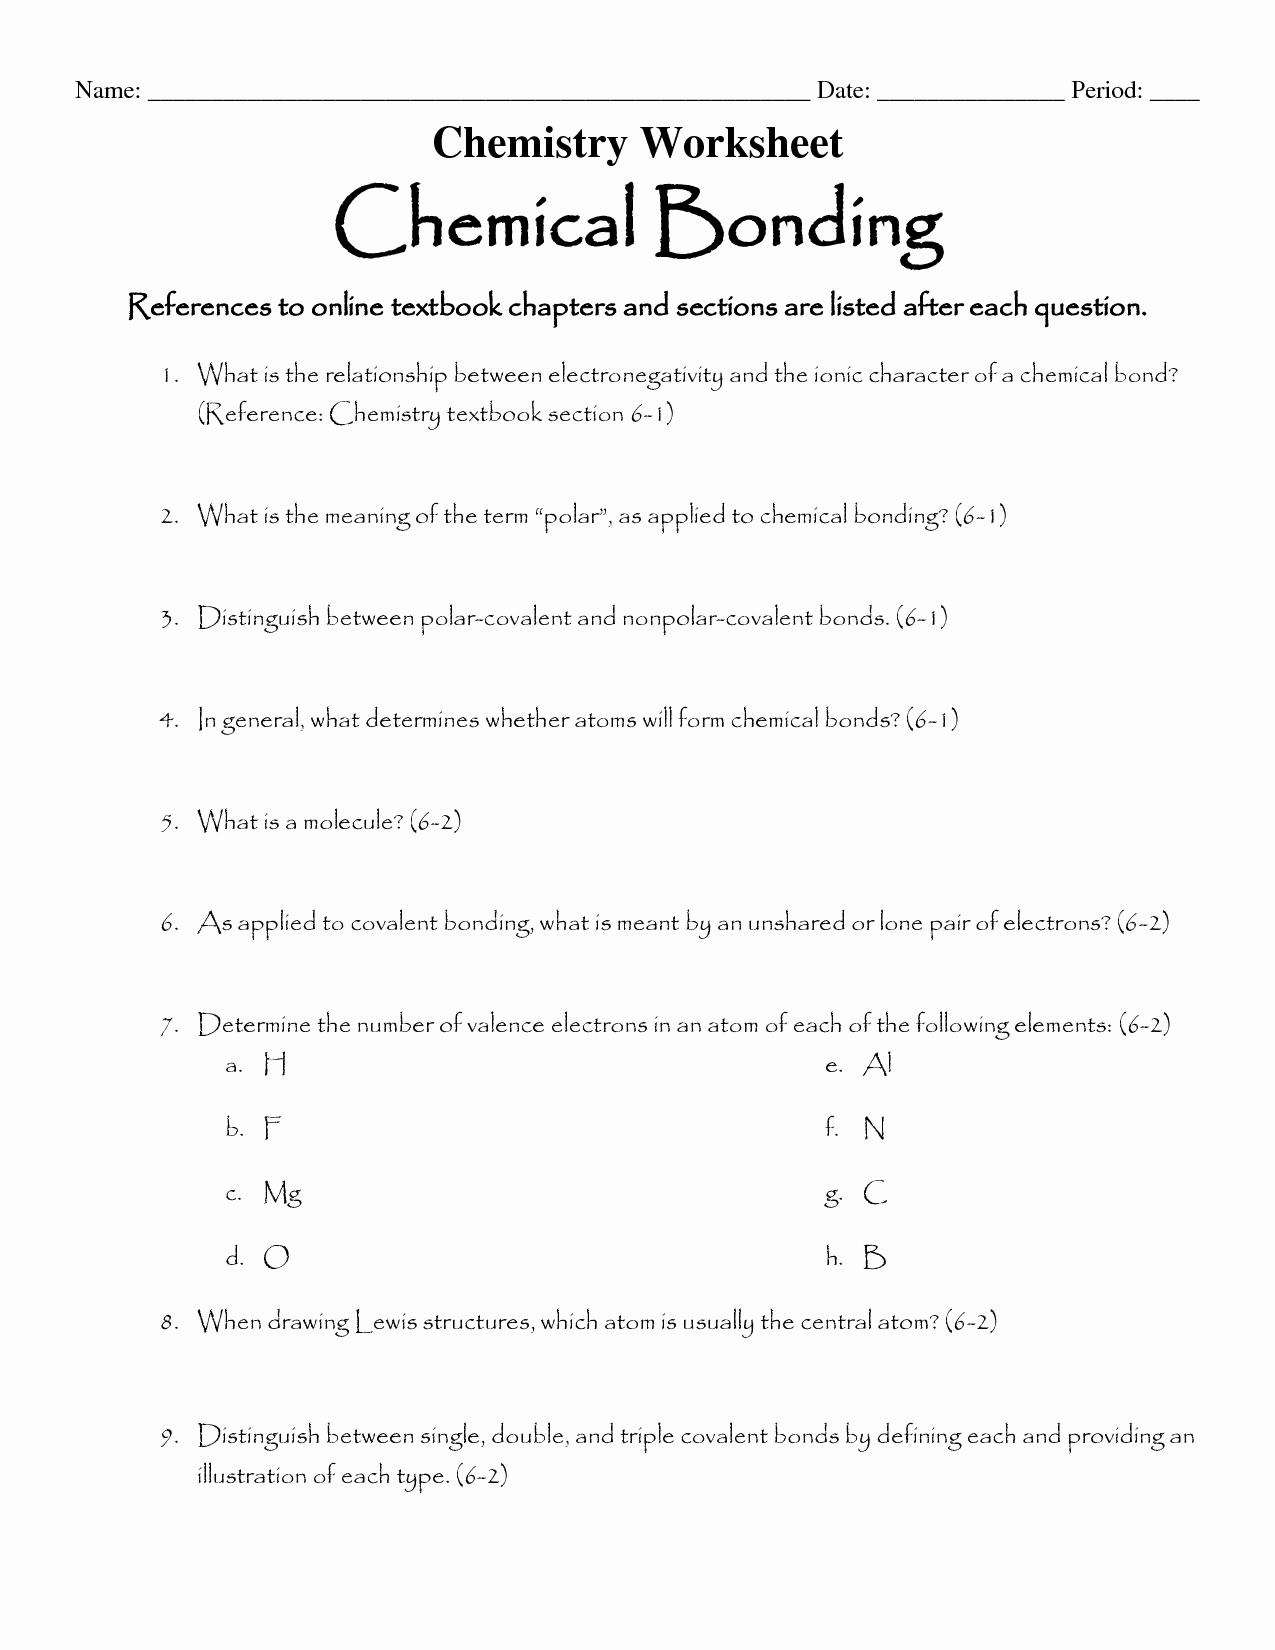 Chemical Bonding Worksheet Key Unique 16 Best Of Types Chemical Bonds Worksheet